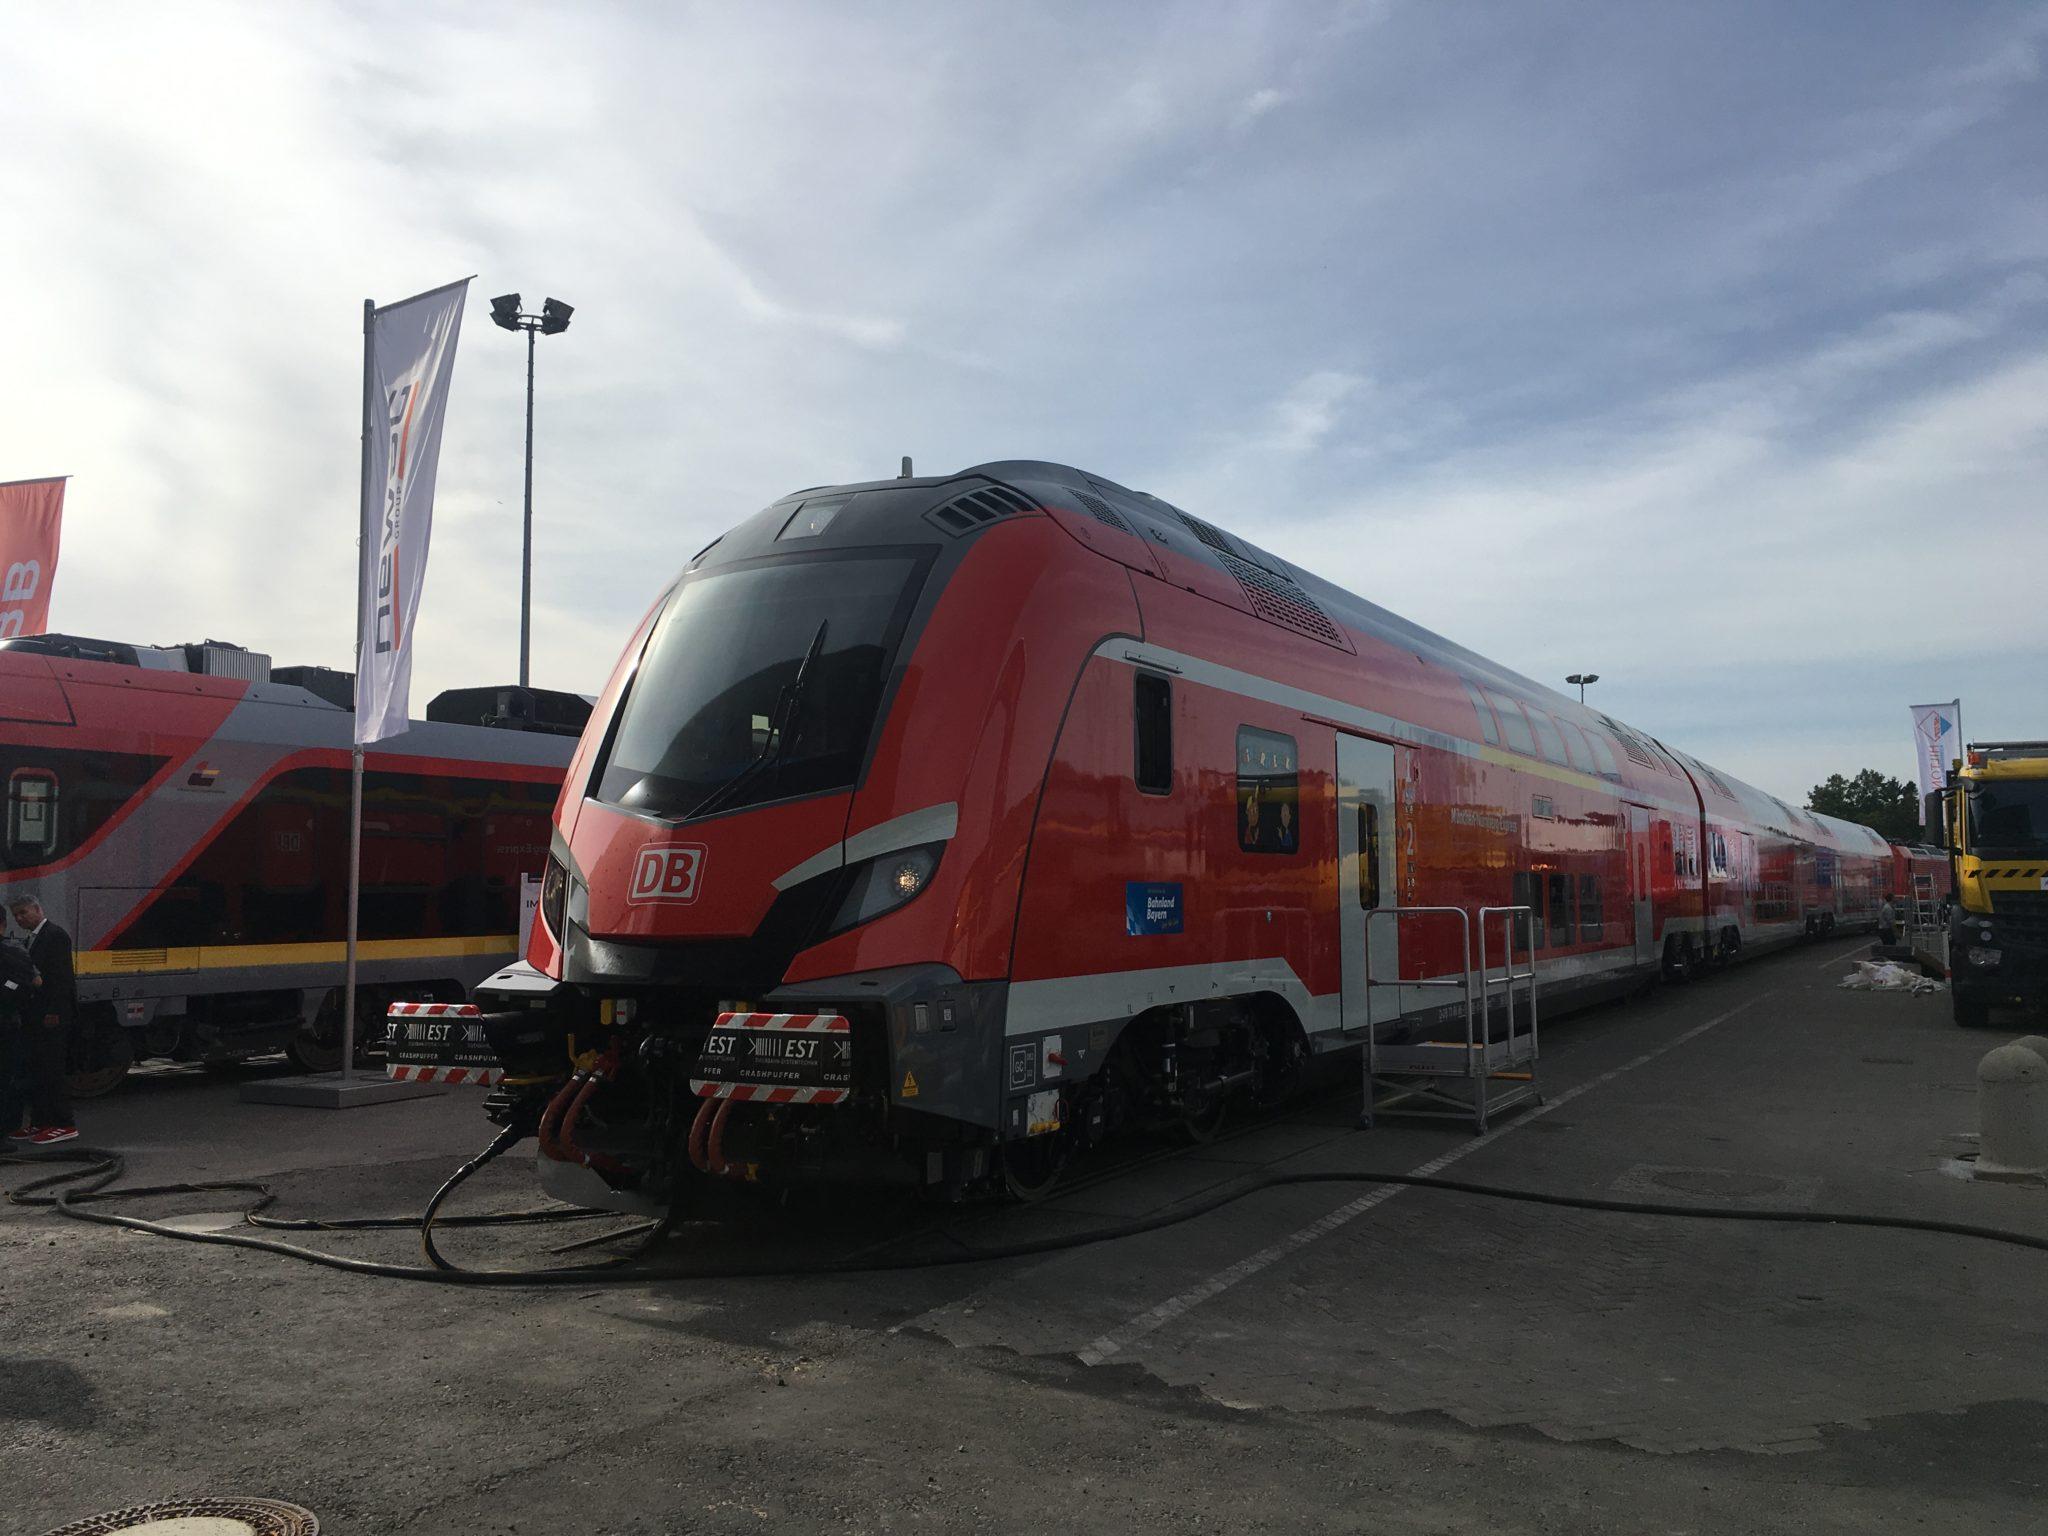 Škoda push-pull trainset